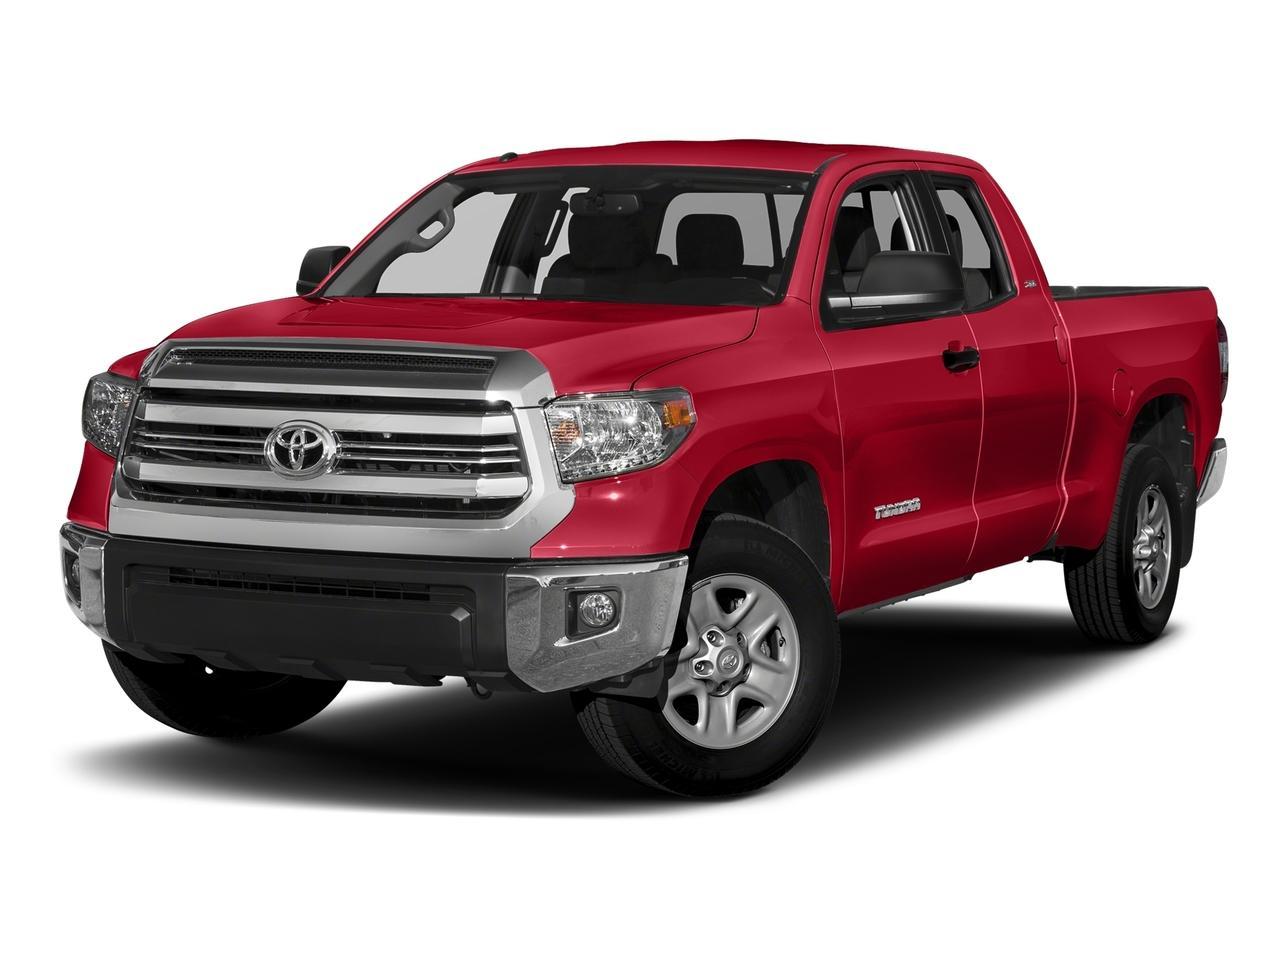 2016 Toyota Tundra 4WD Truck Vehicle Photo in King George, VA 22485